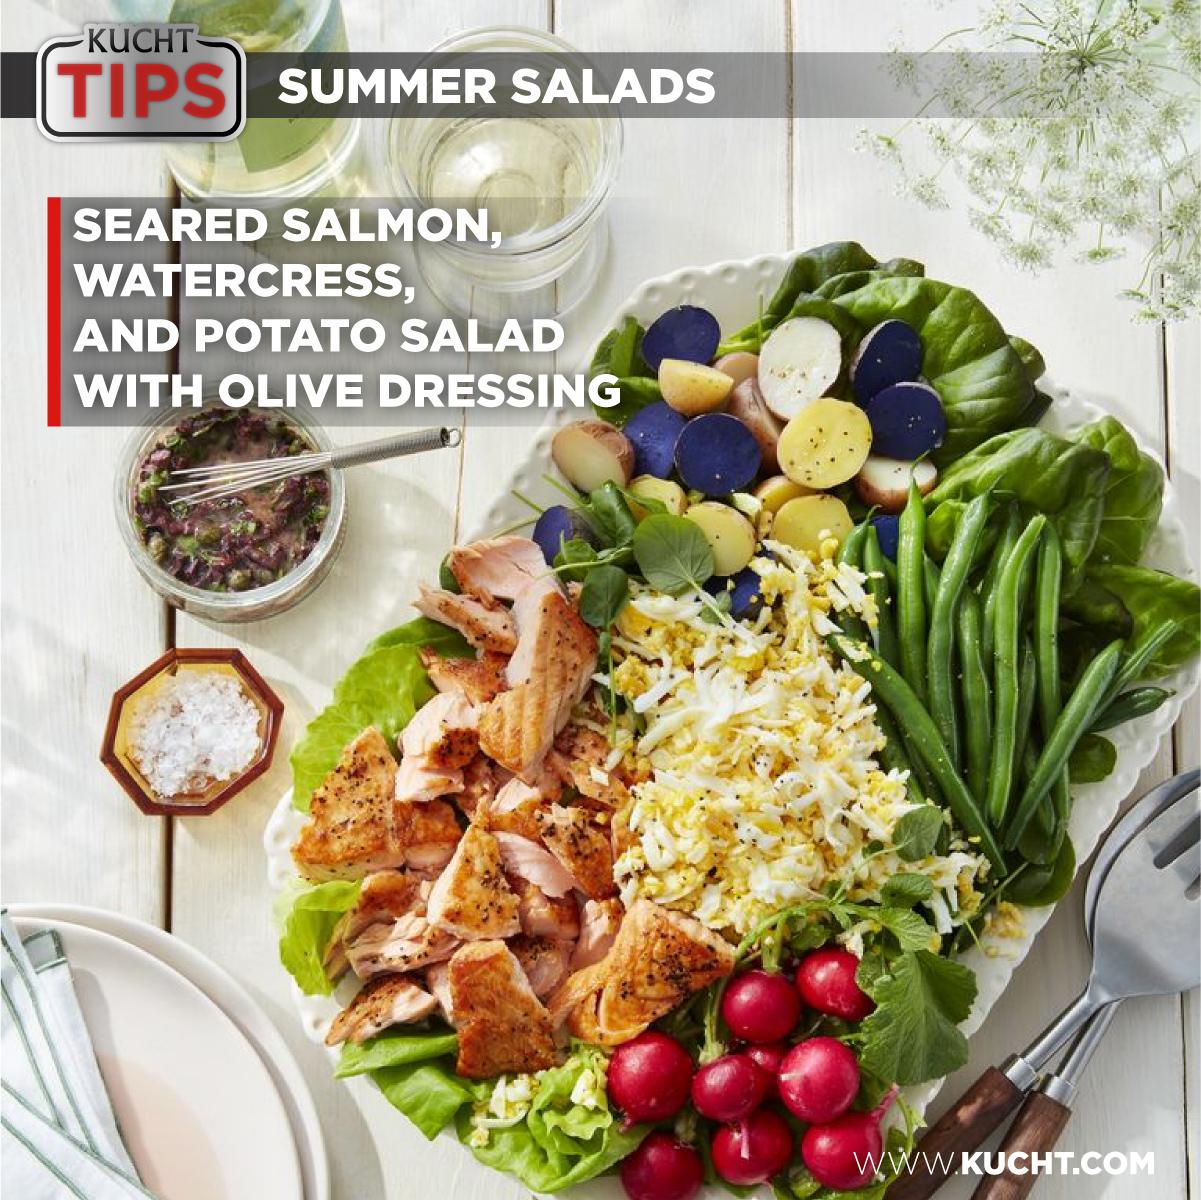 SUMMER SALADS 03 - RECIPES